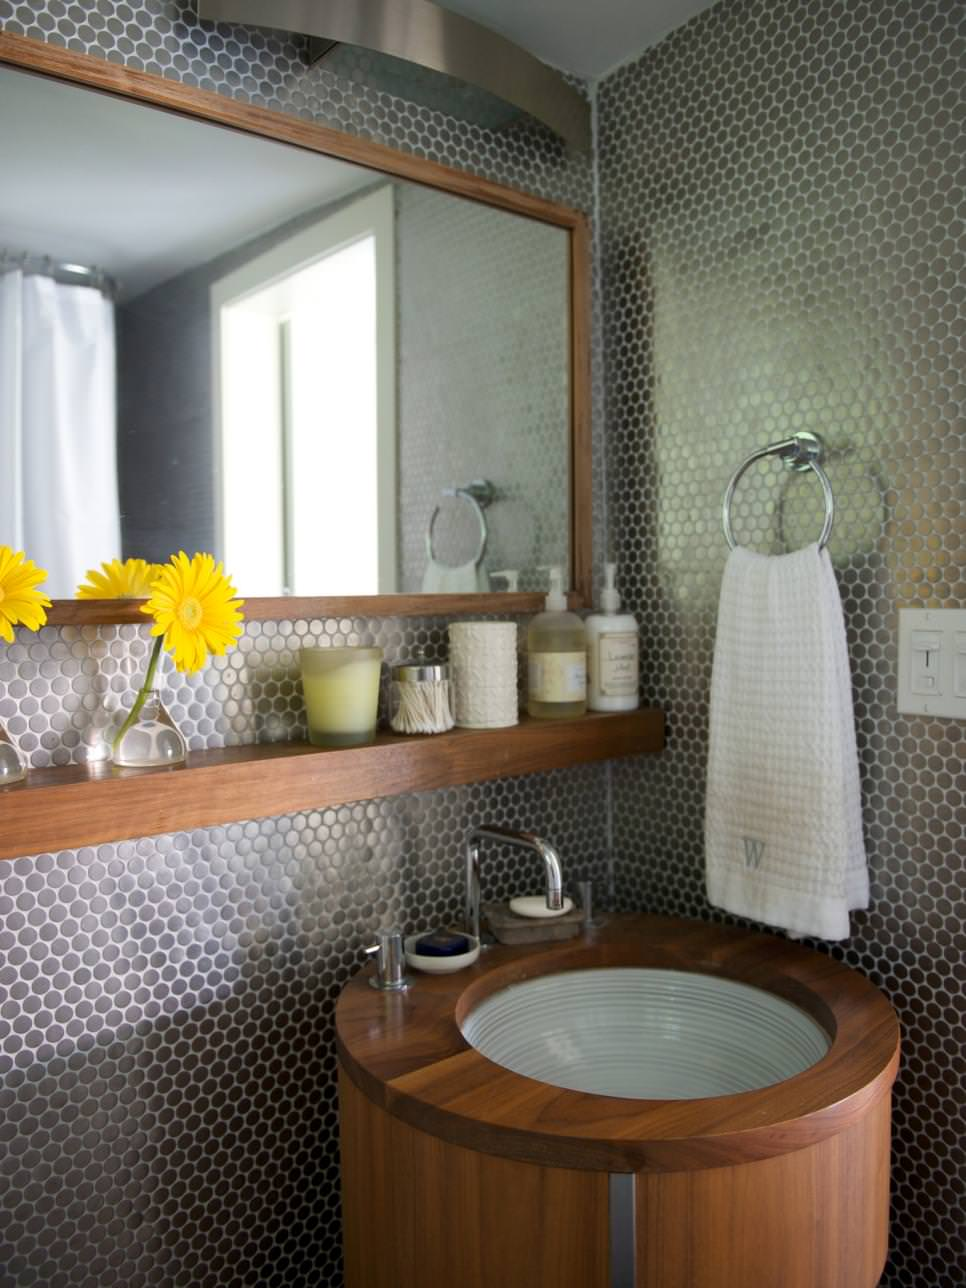 Fullsize Of Bathroom Sink Ideas